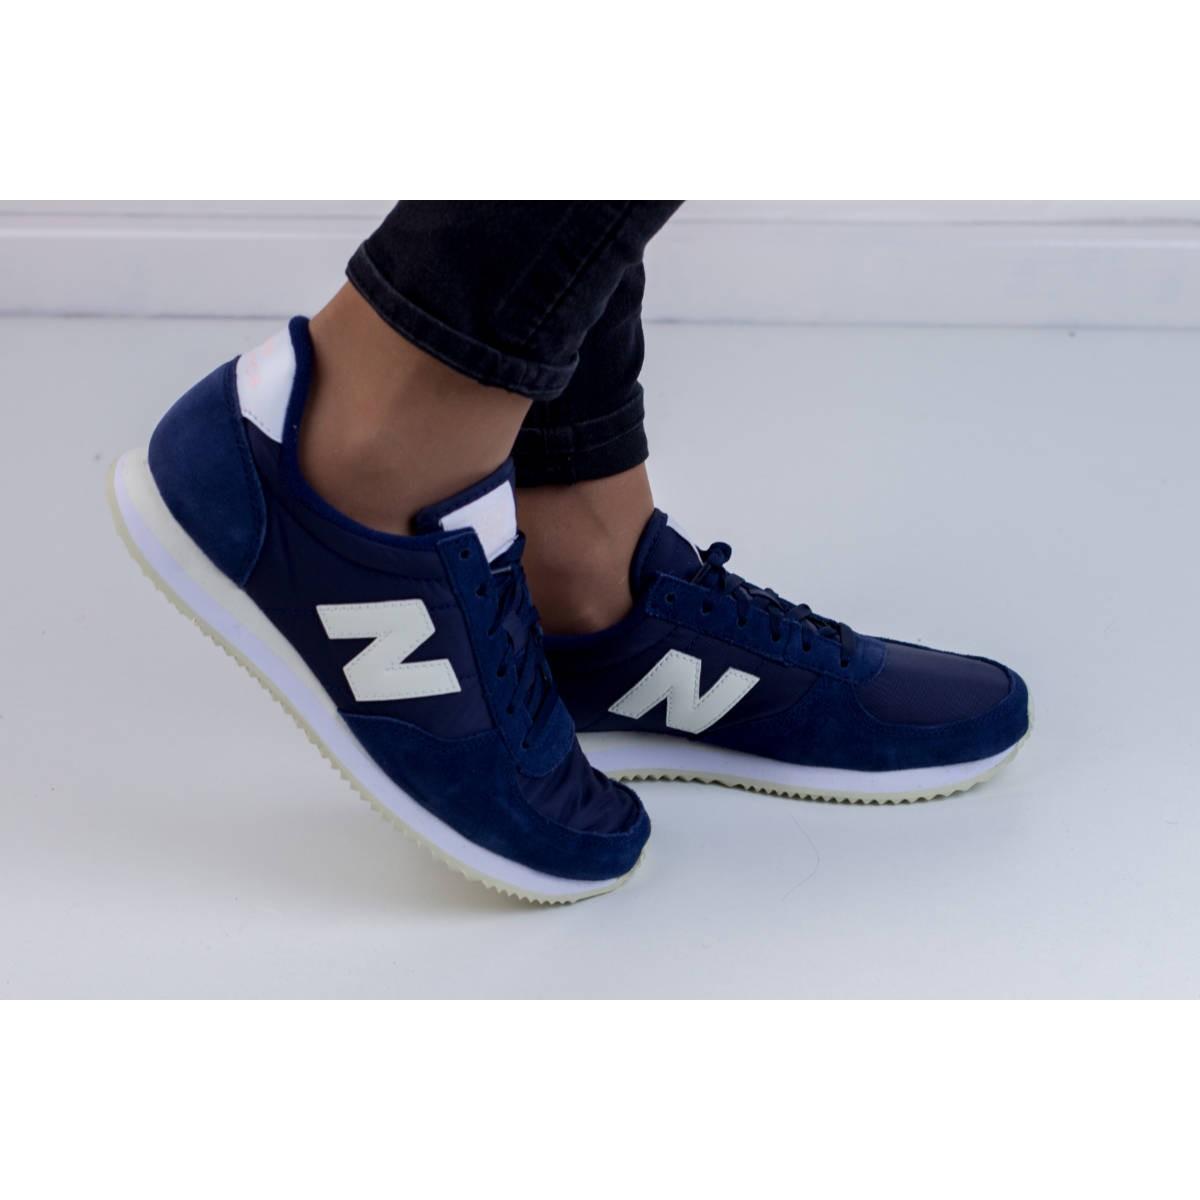 zapatillas new balance mujer azul marino